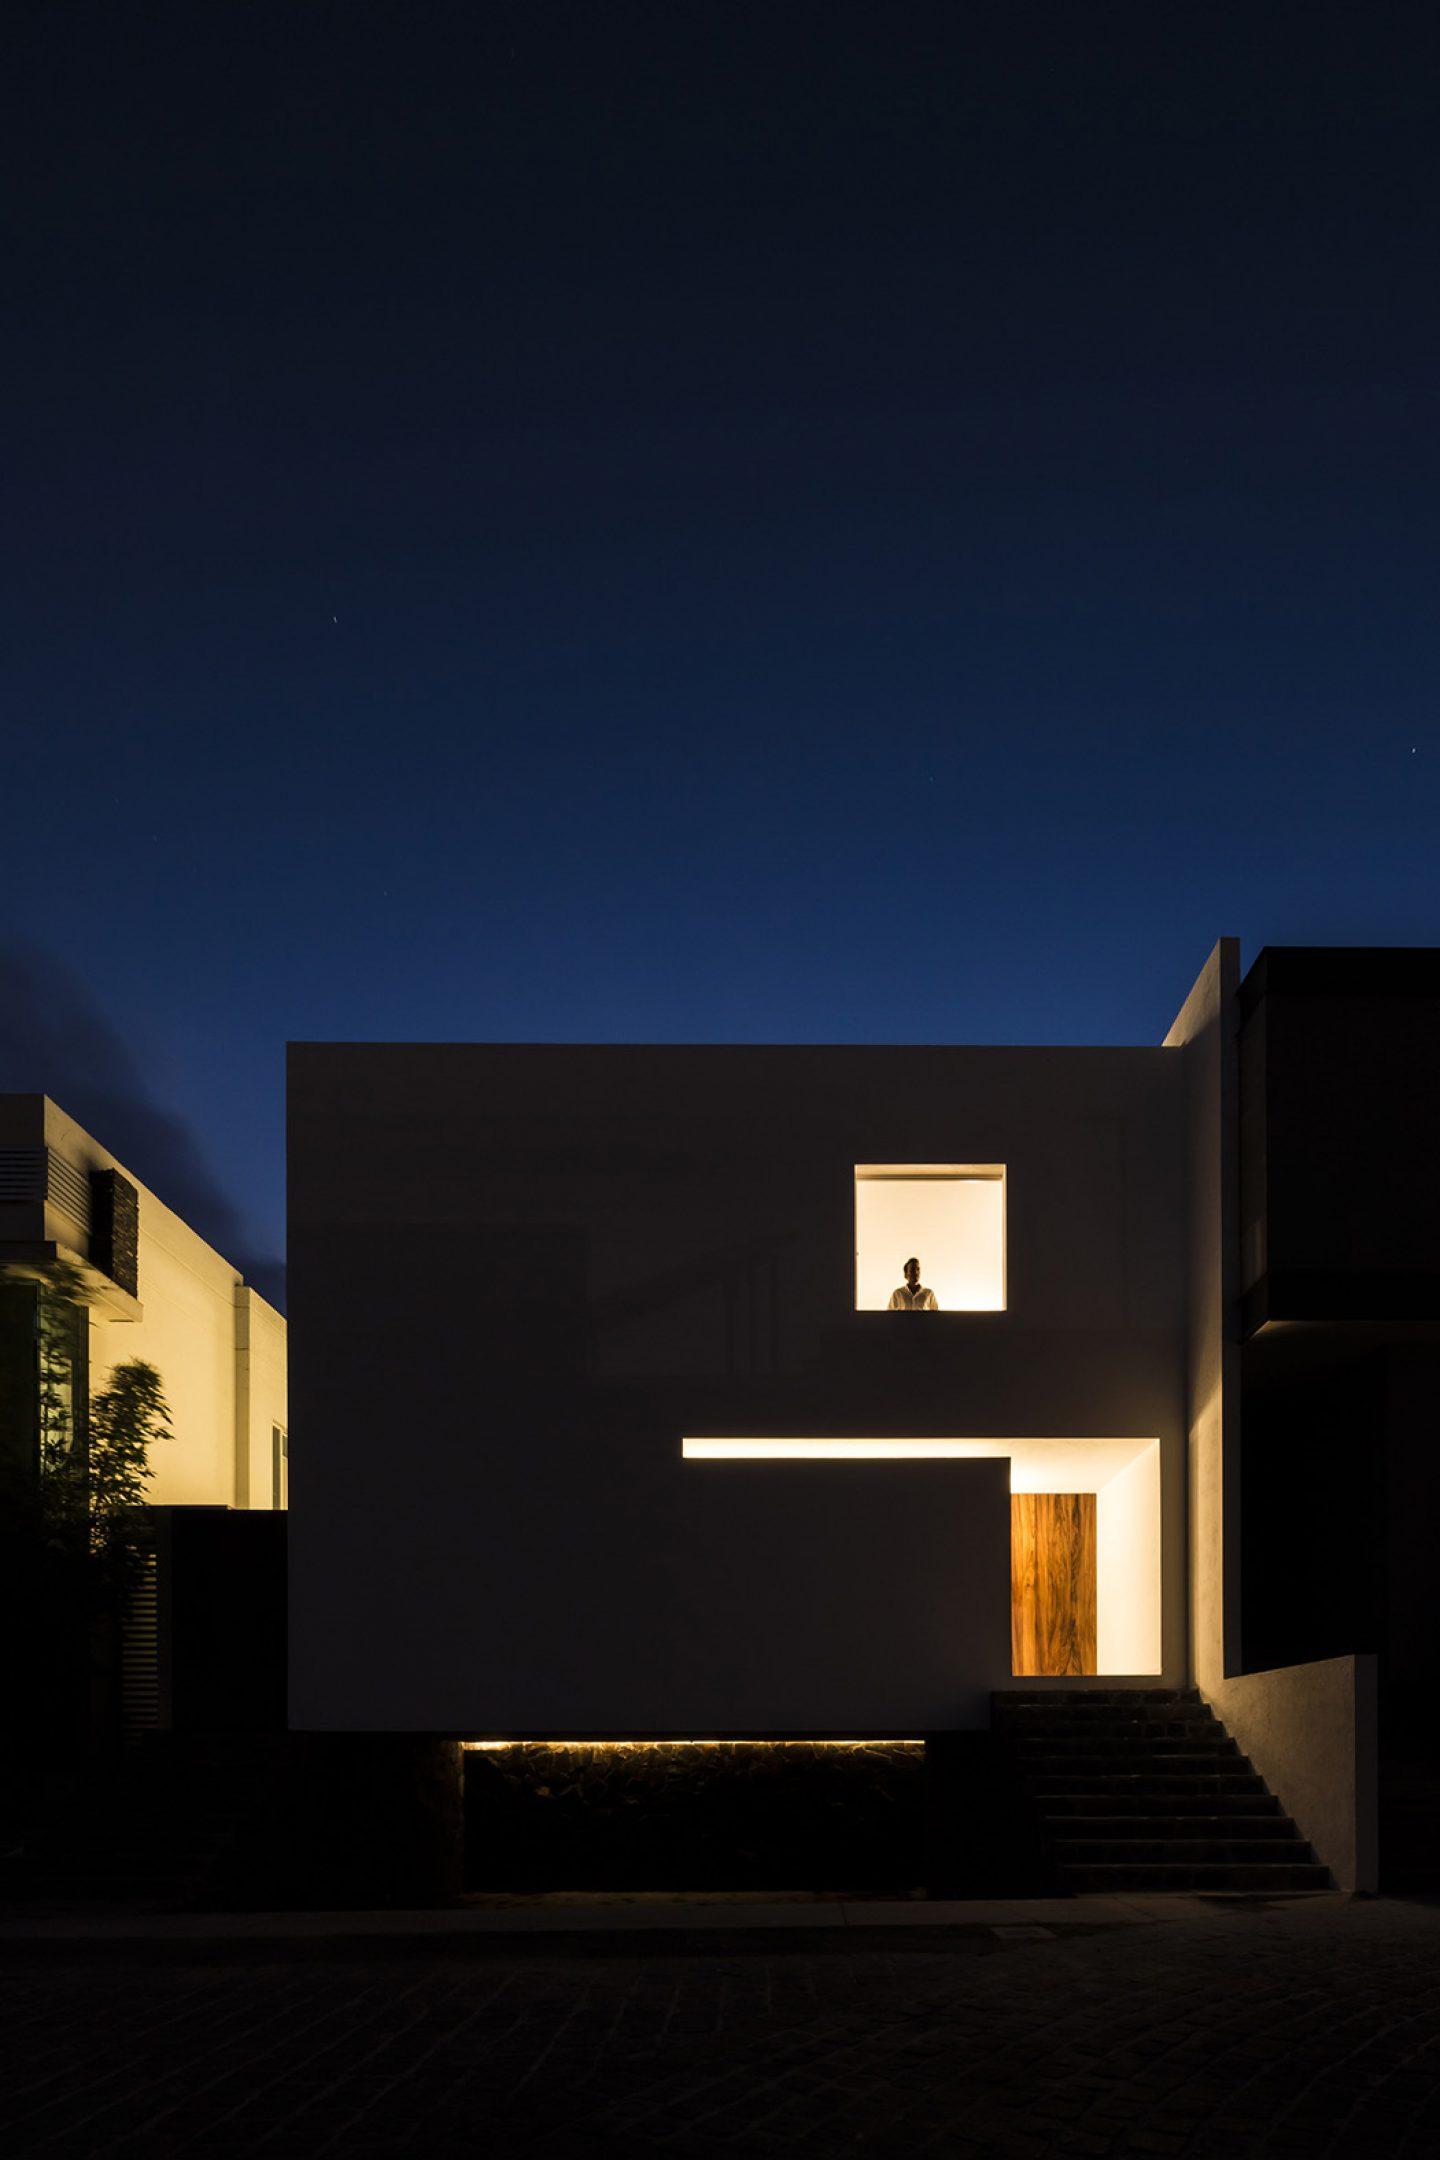 iGNANT_Architecture_Cave_House_Abraham_Cota_Paredes24